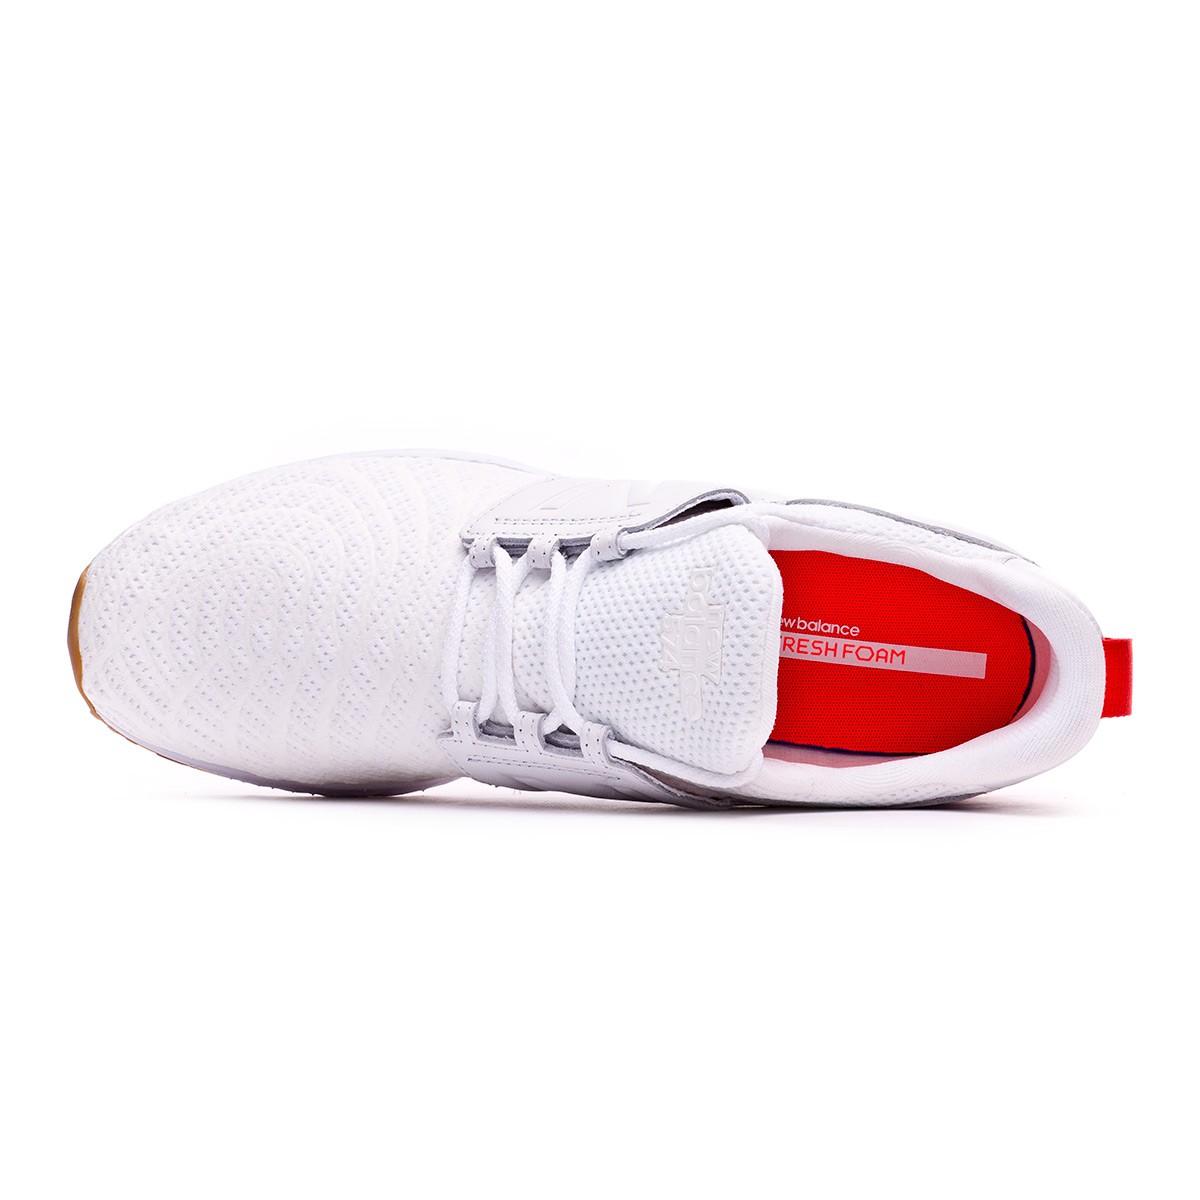 Trainers New Balance MS574 White Red Tienda de fútbol